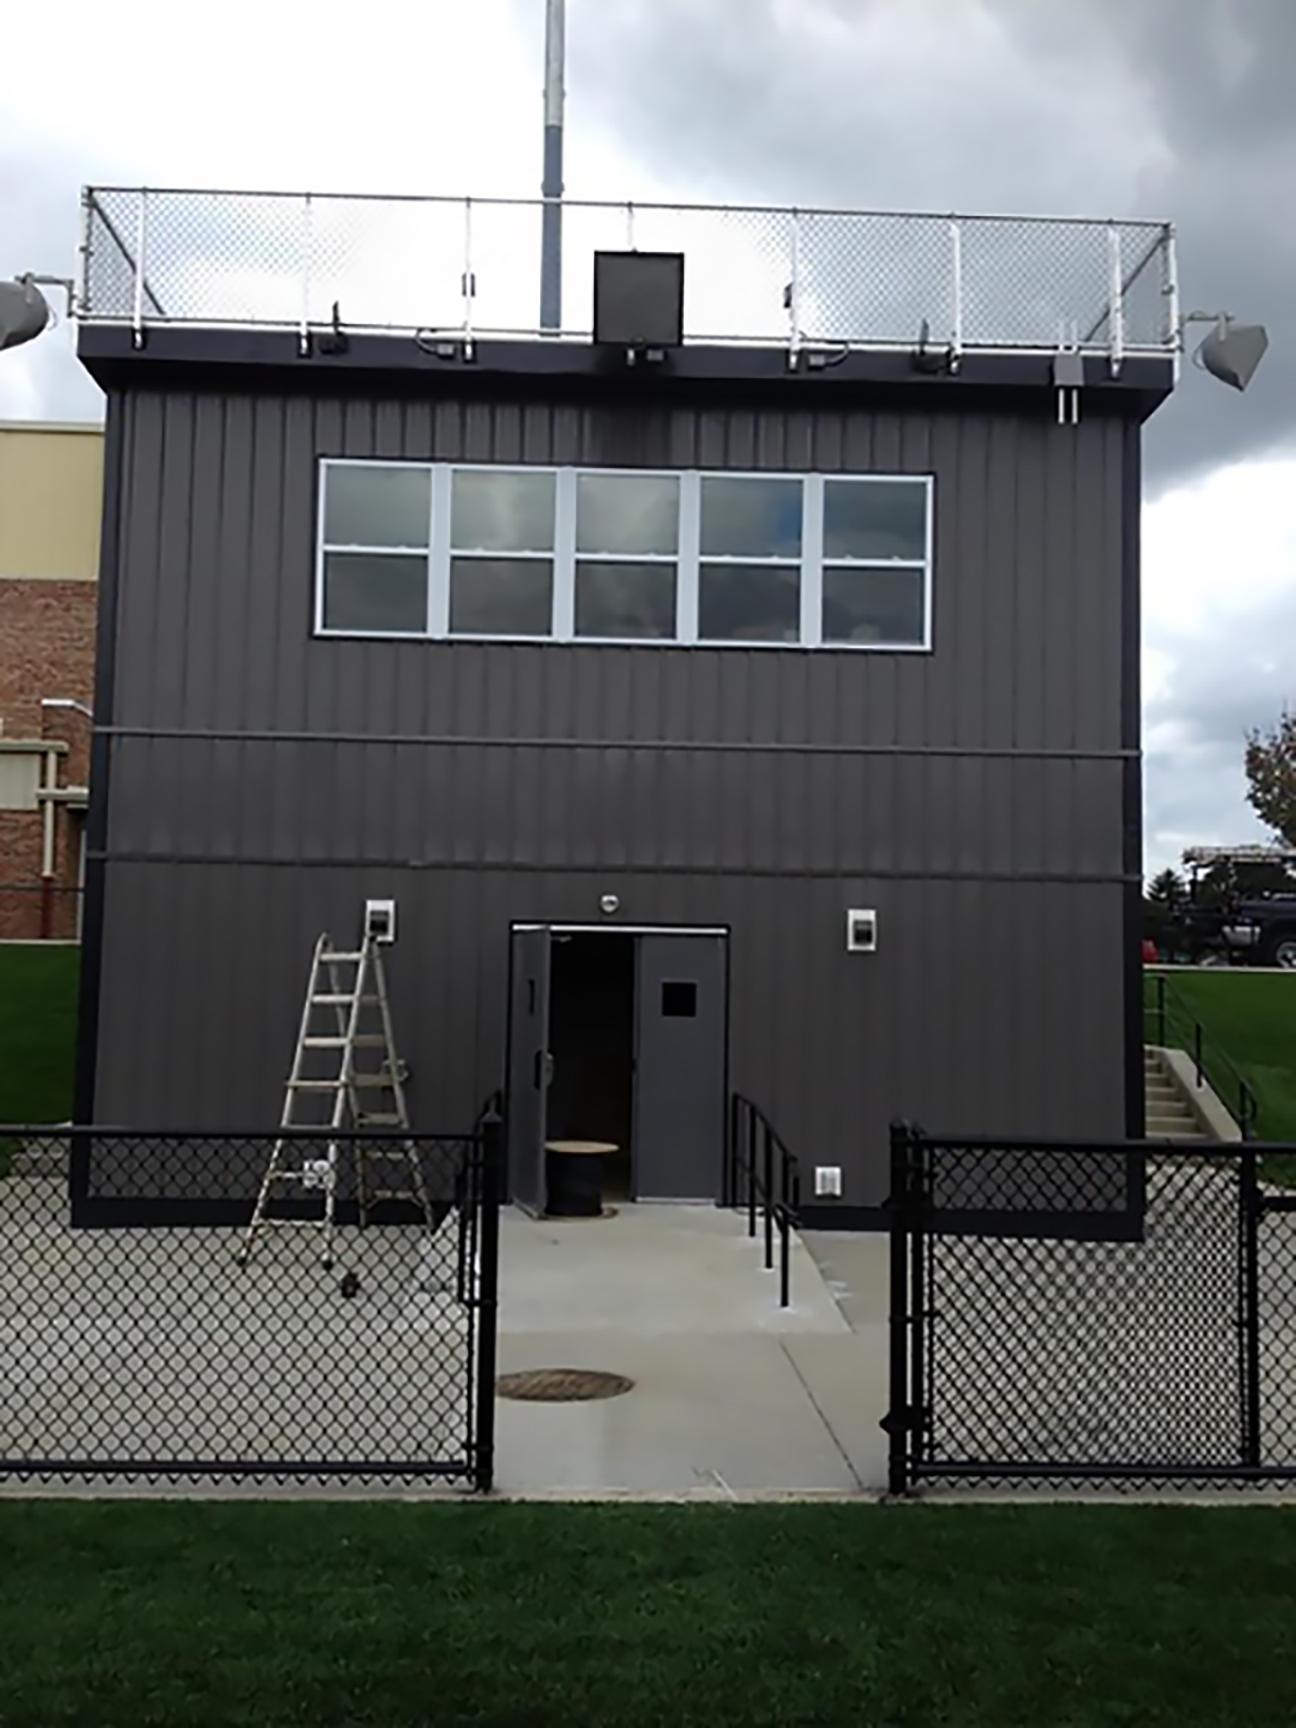 APB Ground Game™ 2-Story Press Box, Pennsylvania